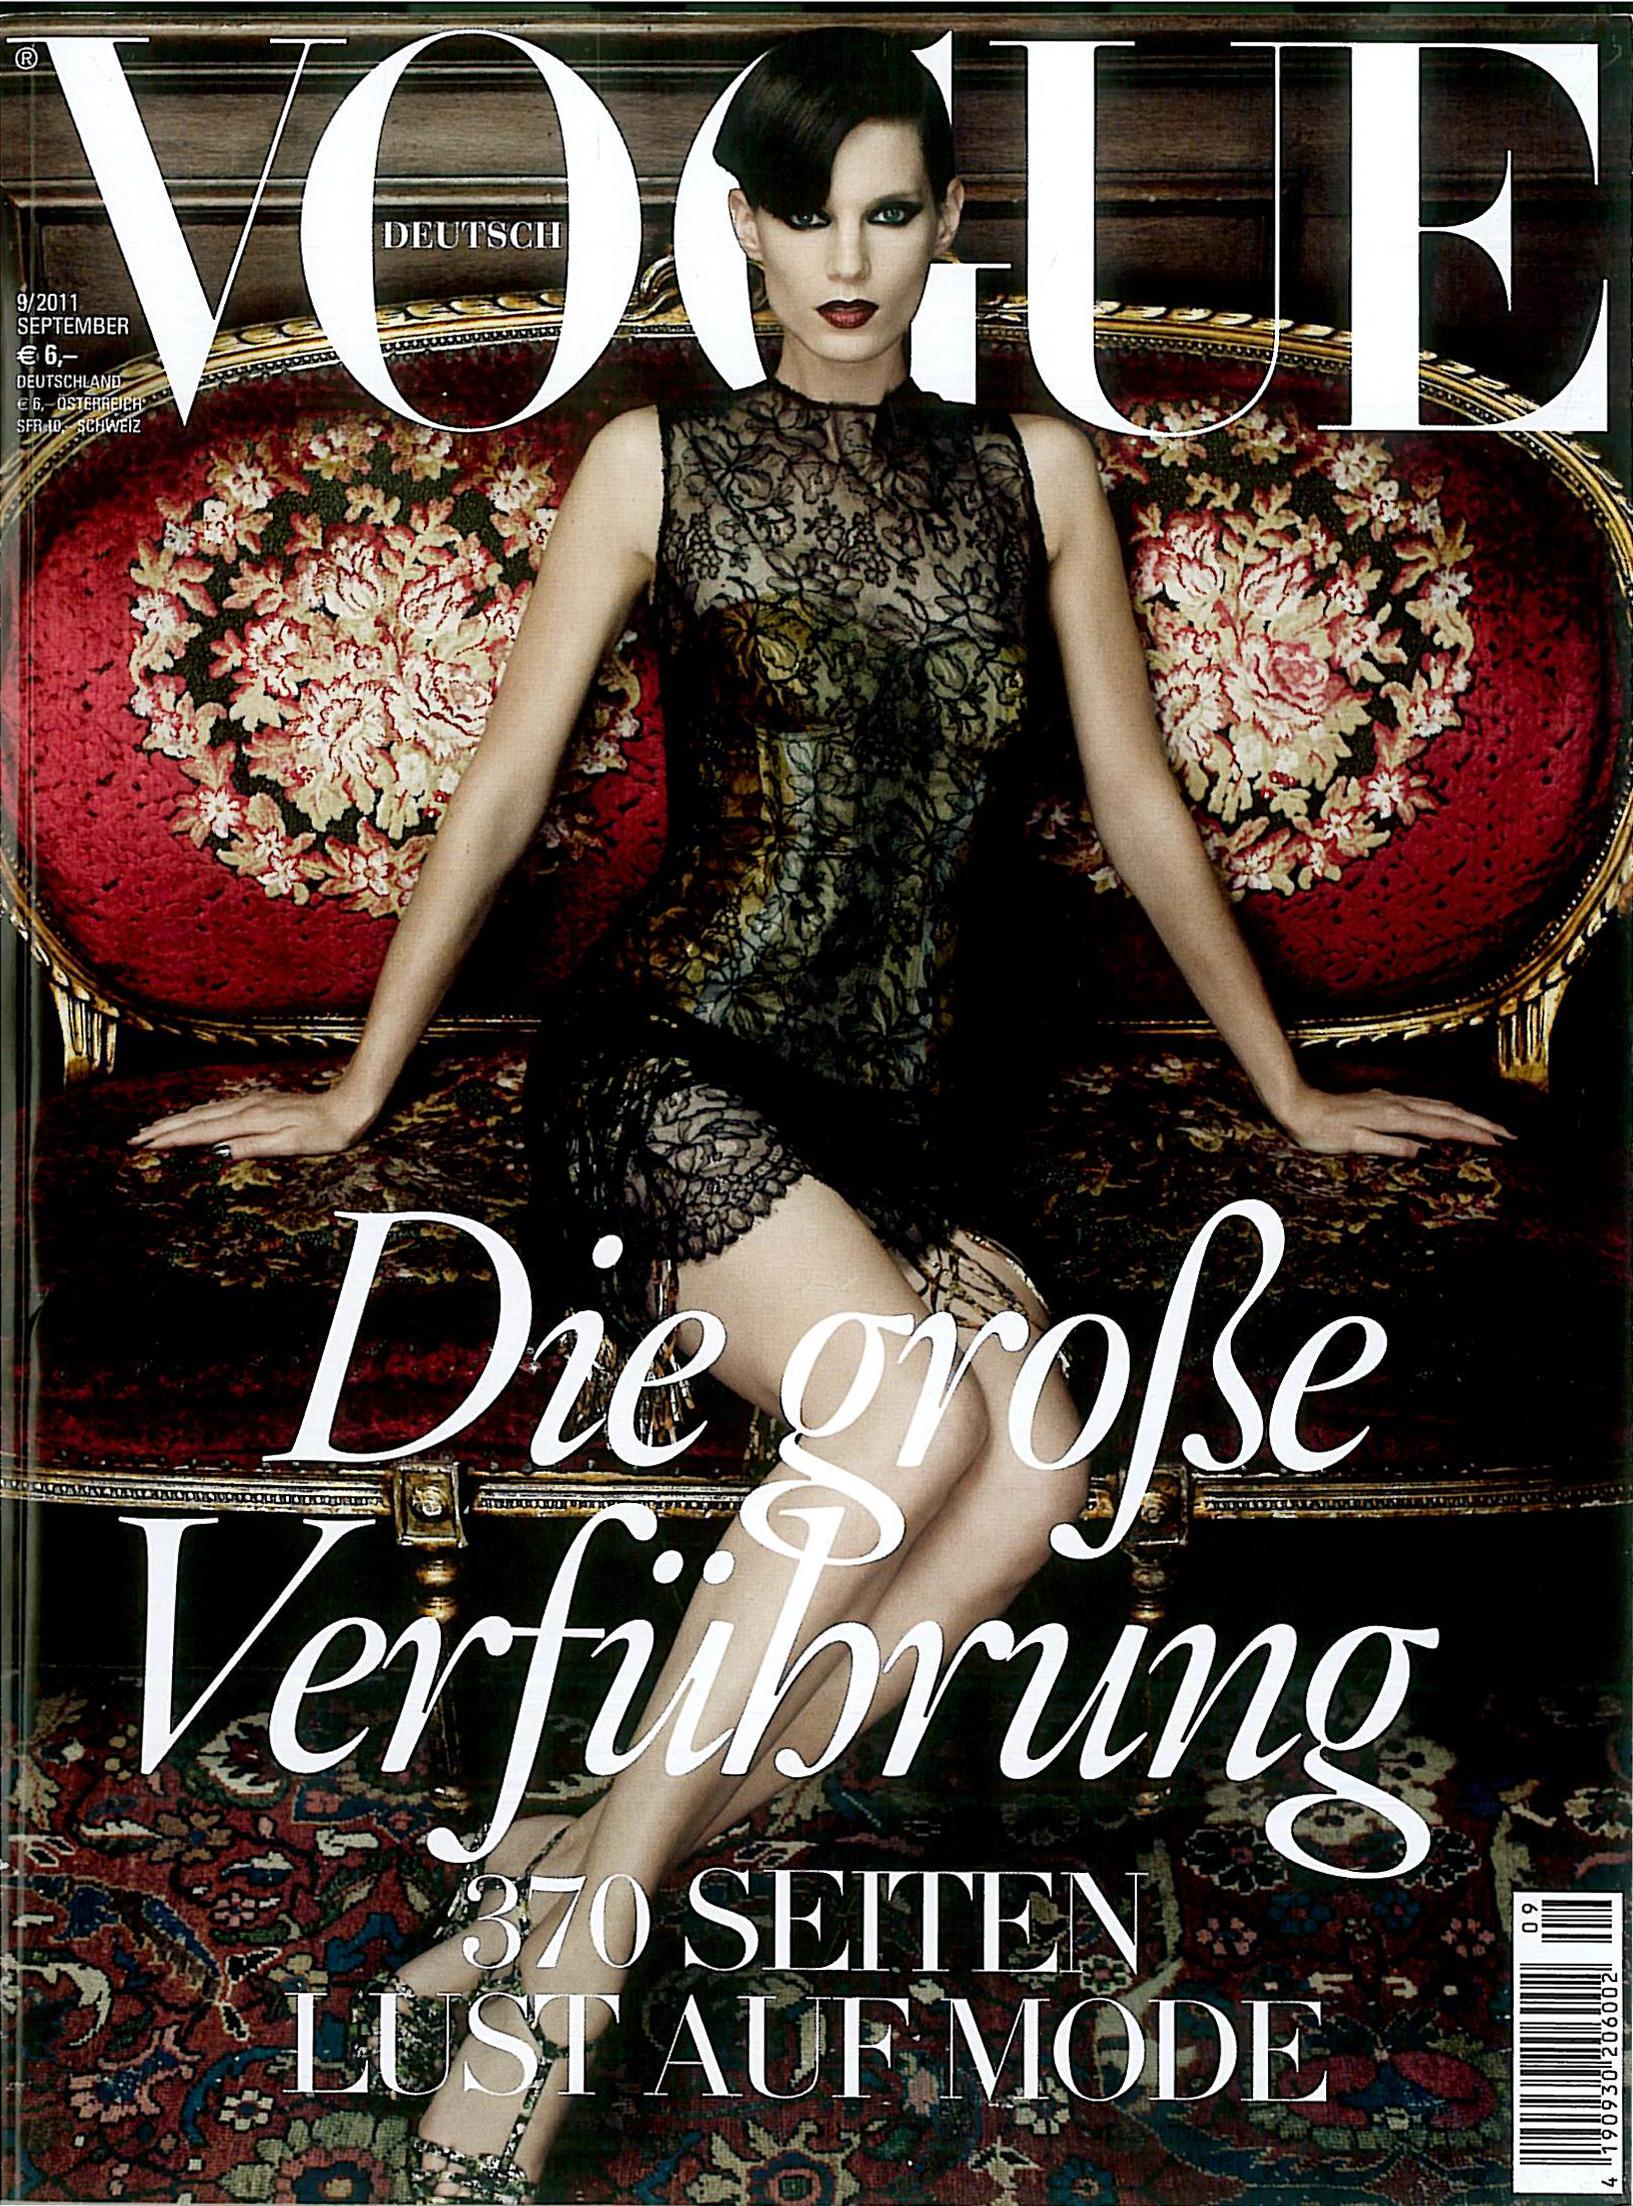 Vogue_09-2011_Pinocchio_S1.jpg